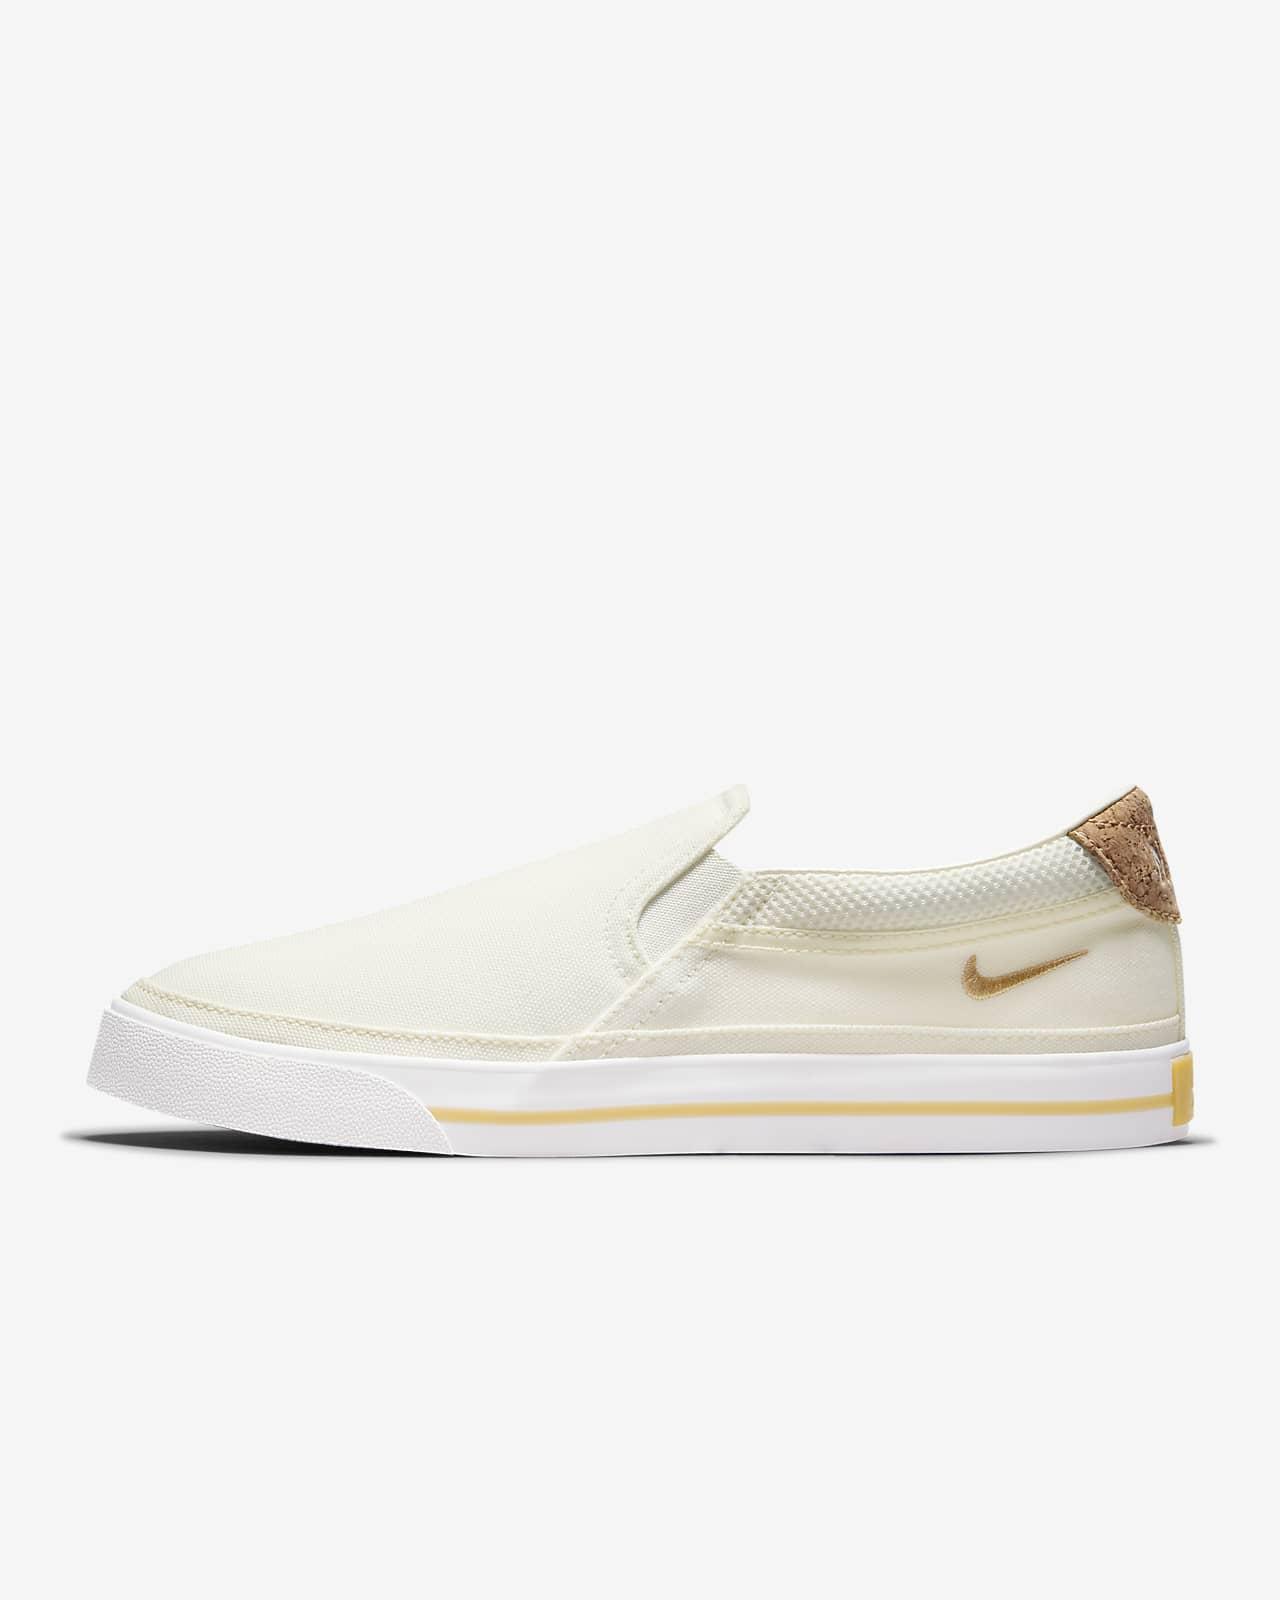 NikeCourt Legacy Women's Slip